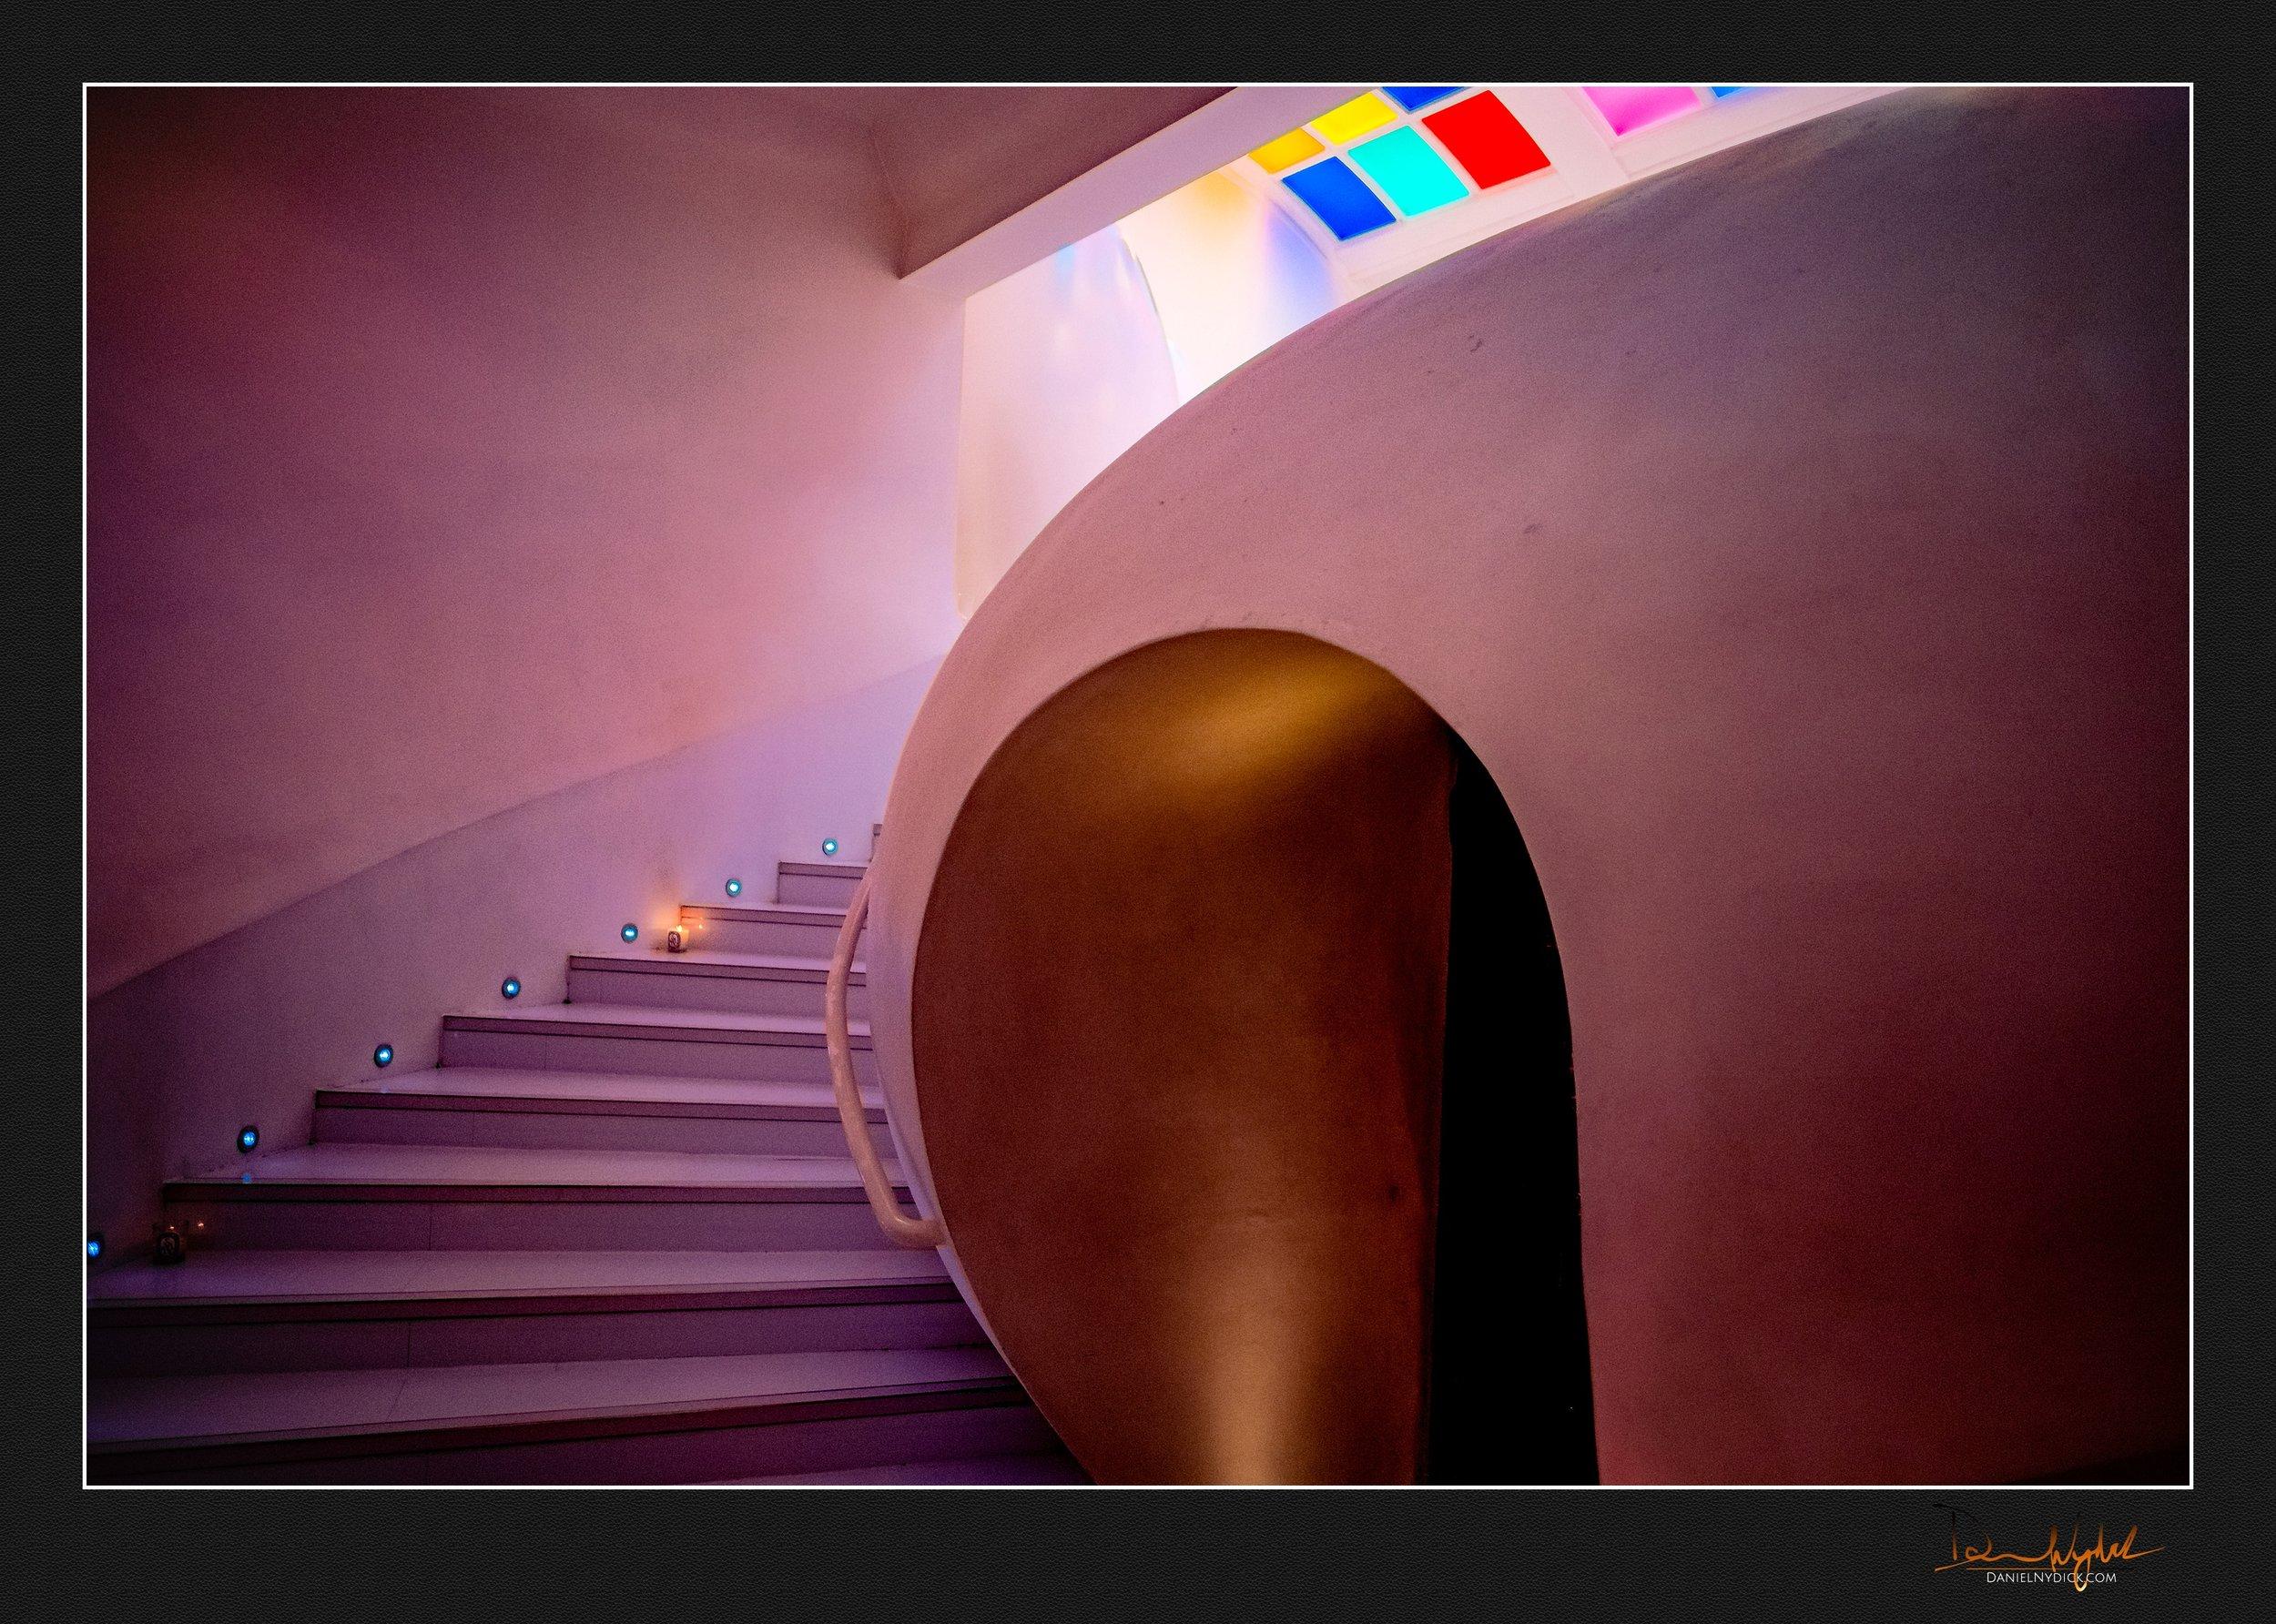 sketch london, pod toilet, restaurant, stairs